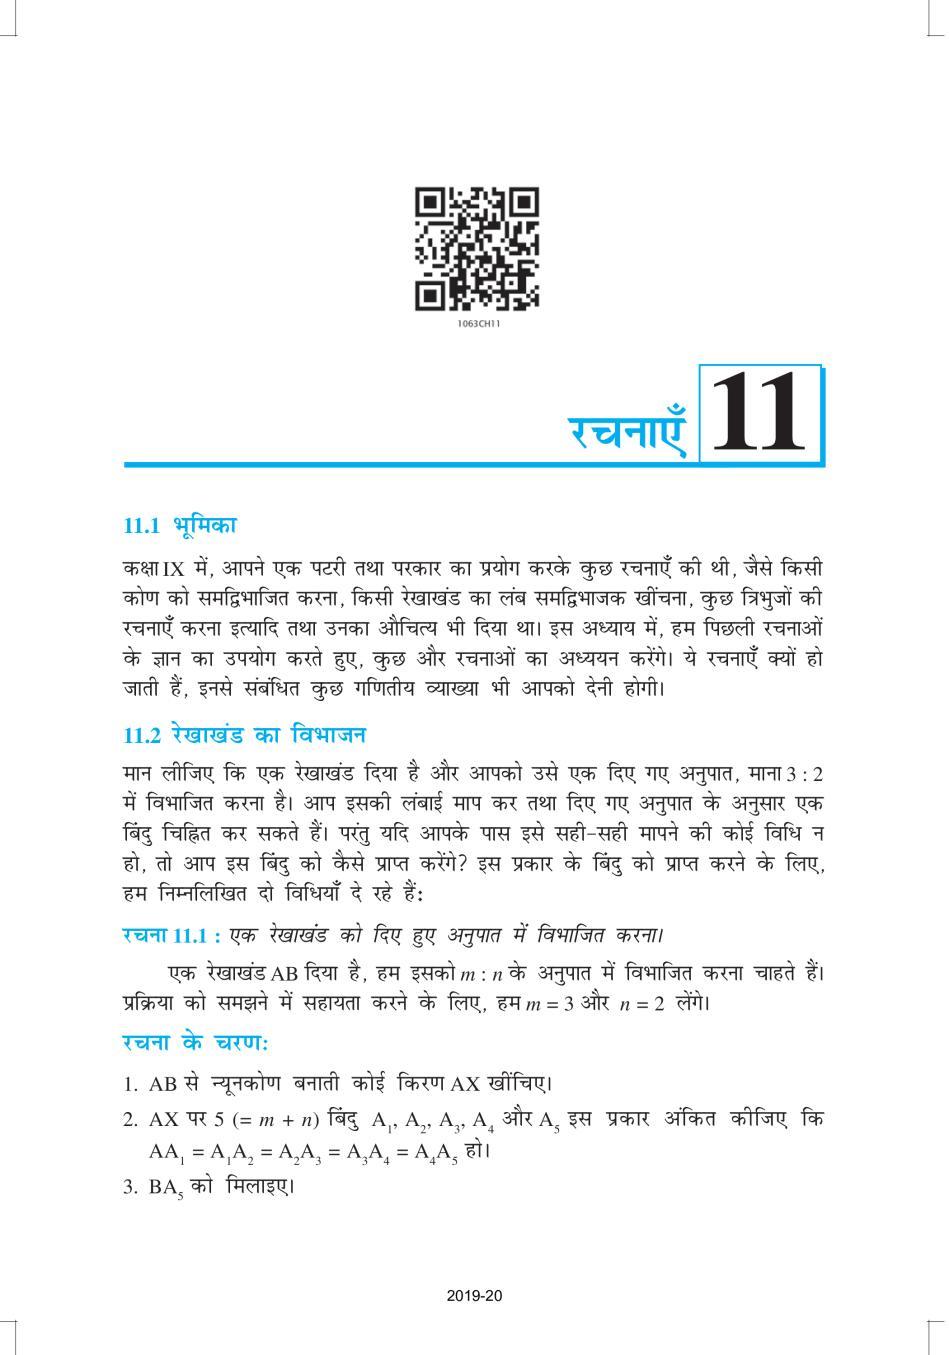 NCERT Book Class 10 Maths (गणित) Chapter 11 रचनाएँ - Page 1